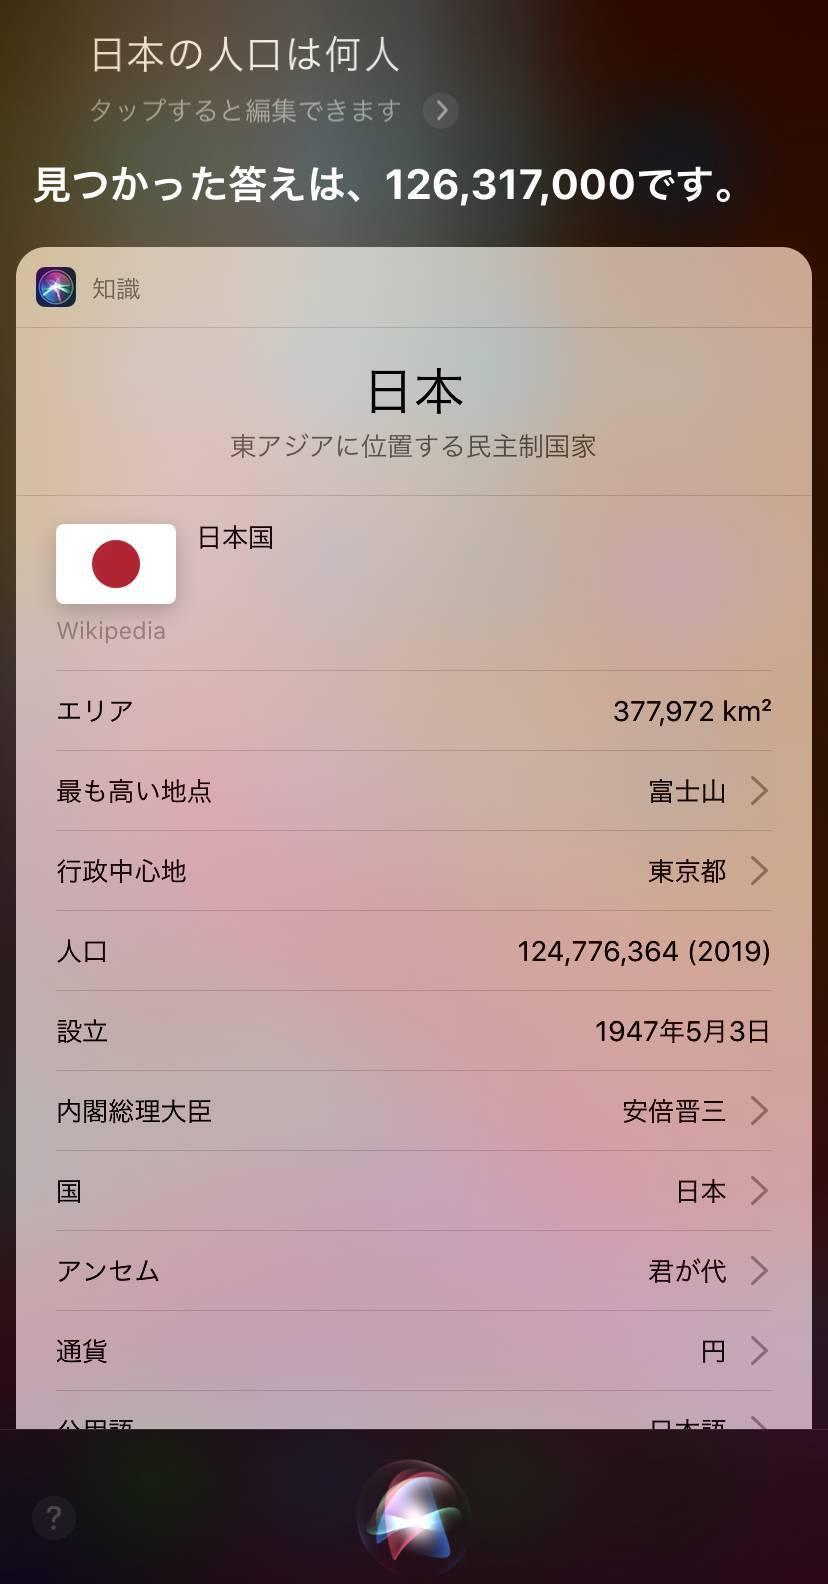 Siri 日本人口